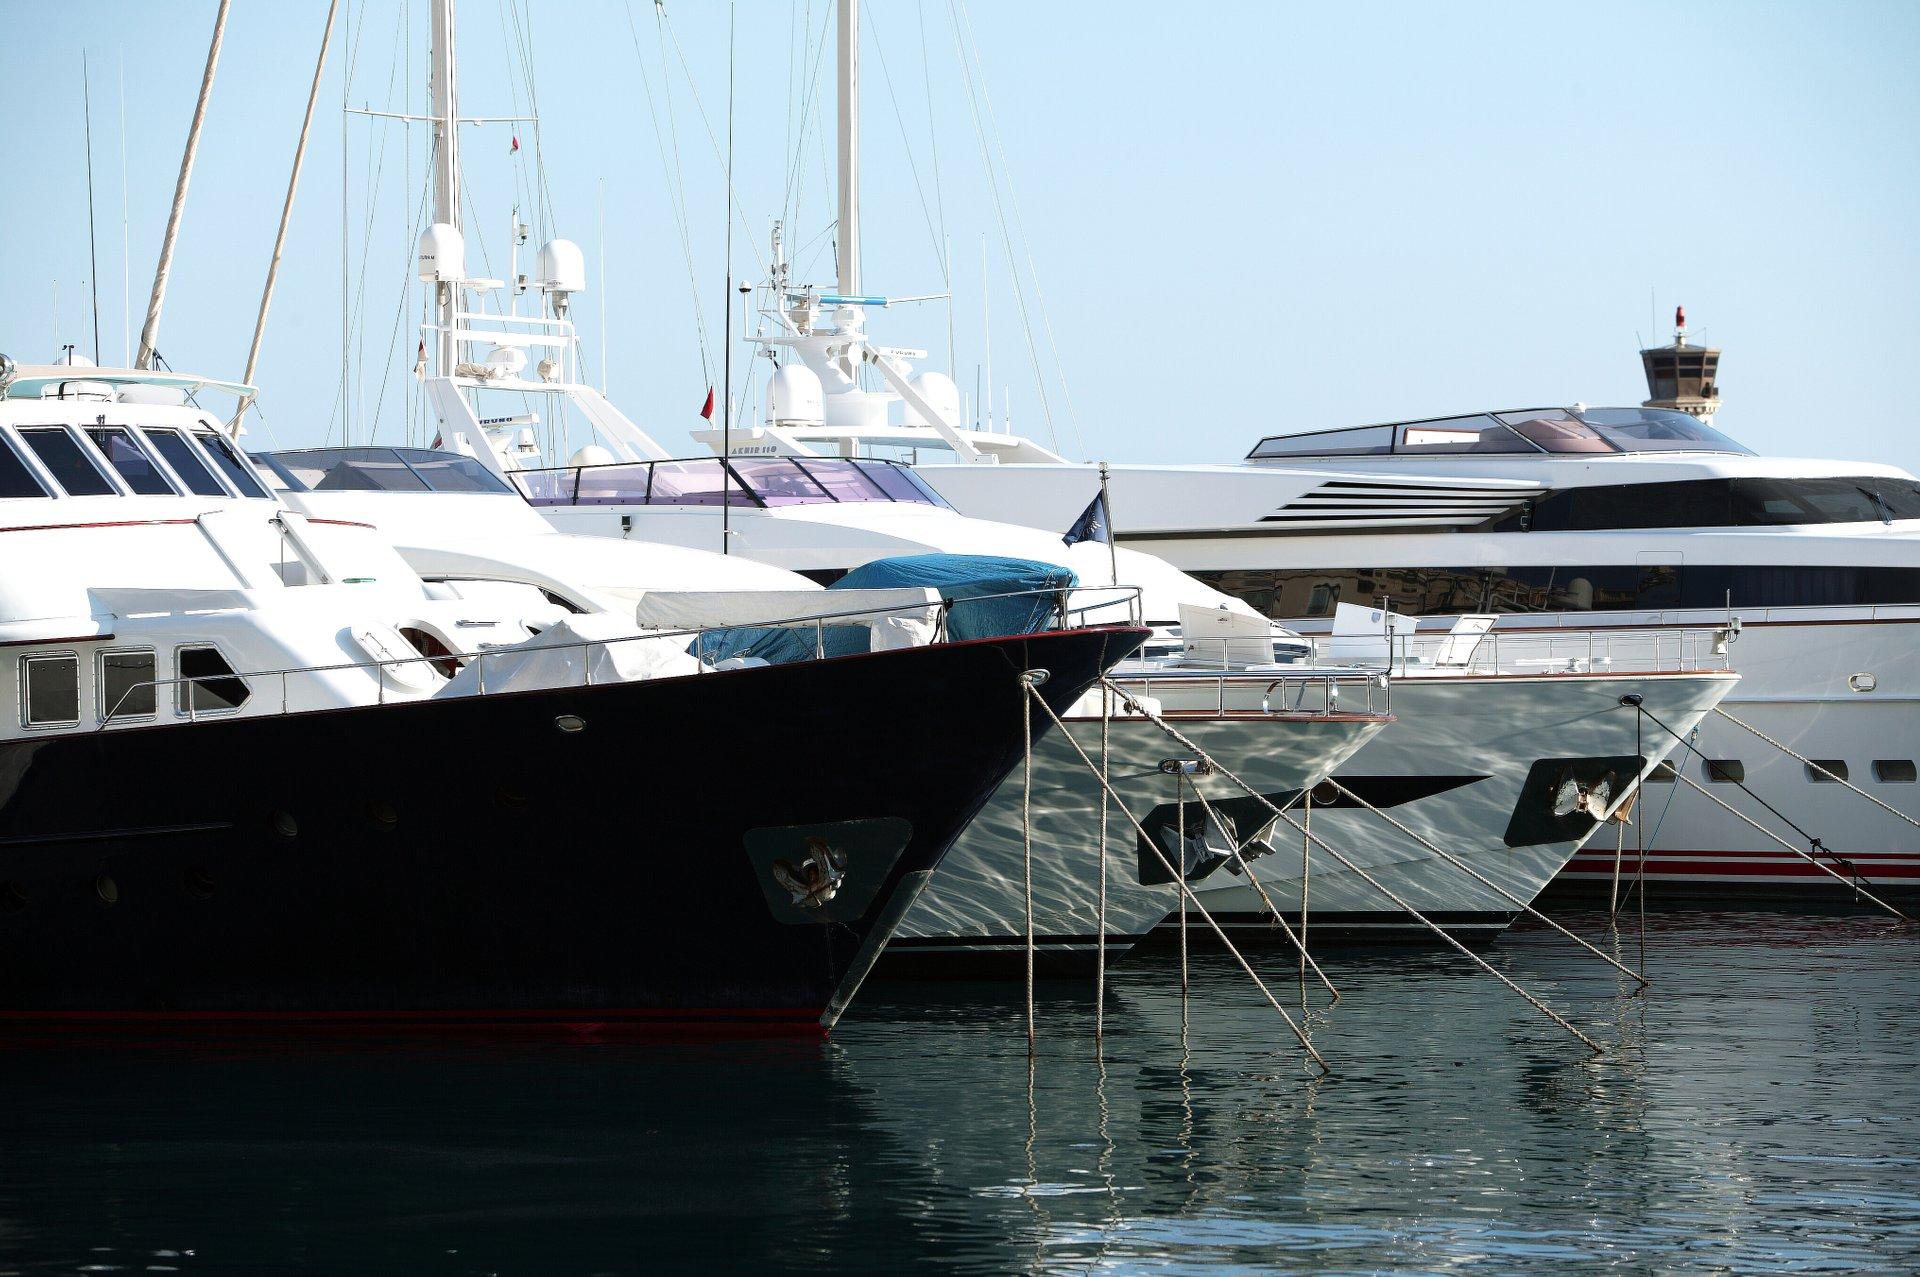 Sailing Season in Monaco - Best Season